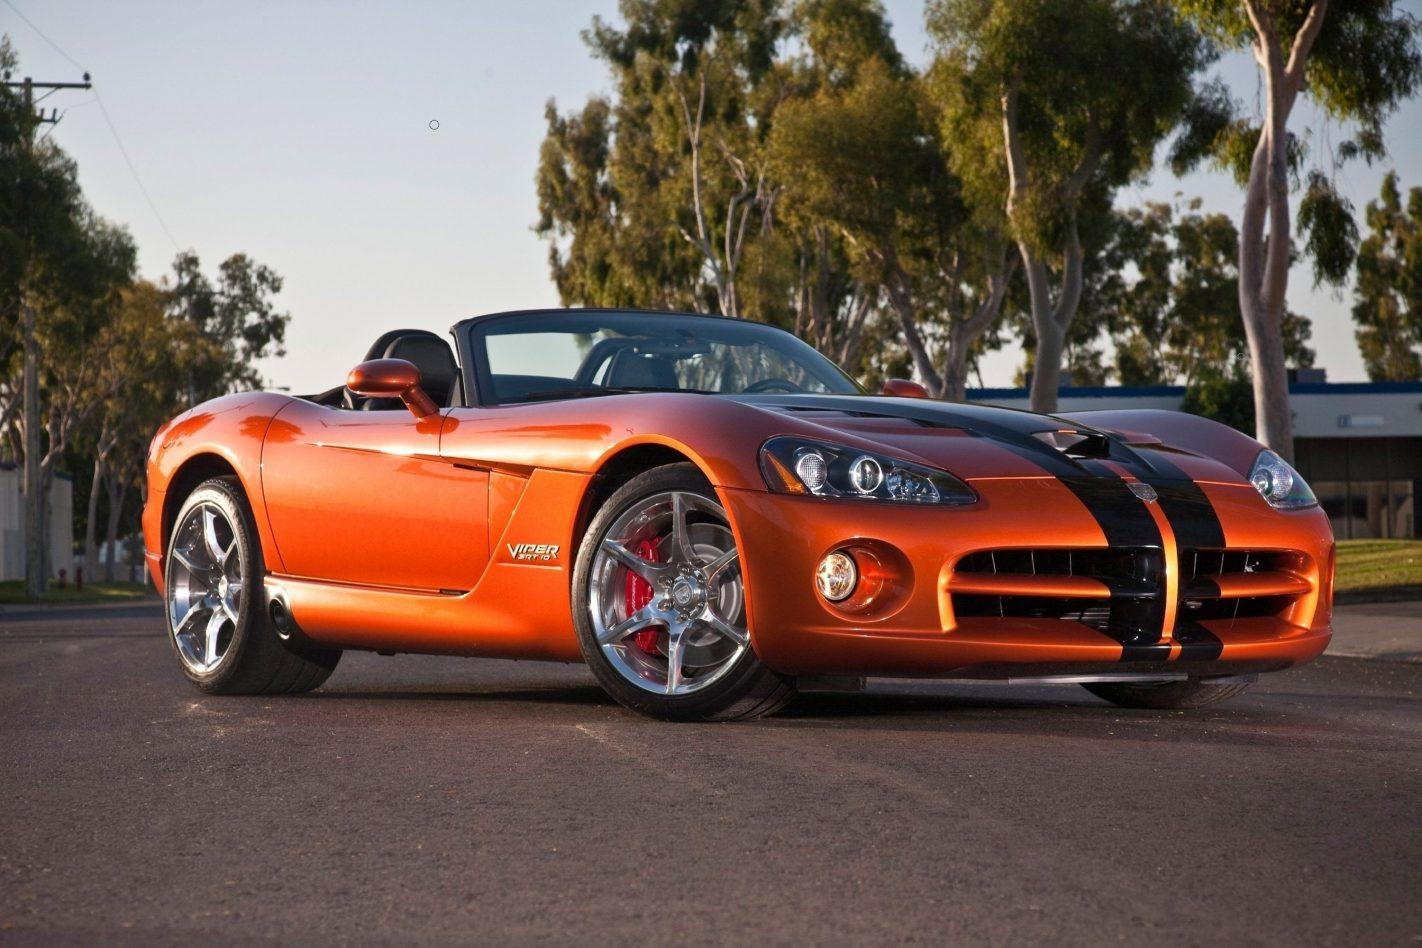 Evolution Car: 2019-dodge-viper-roadster-photo